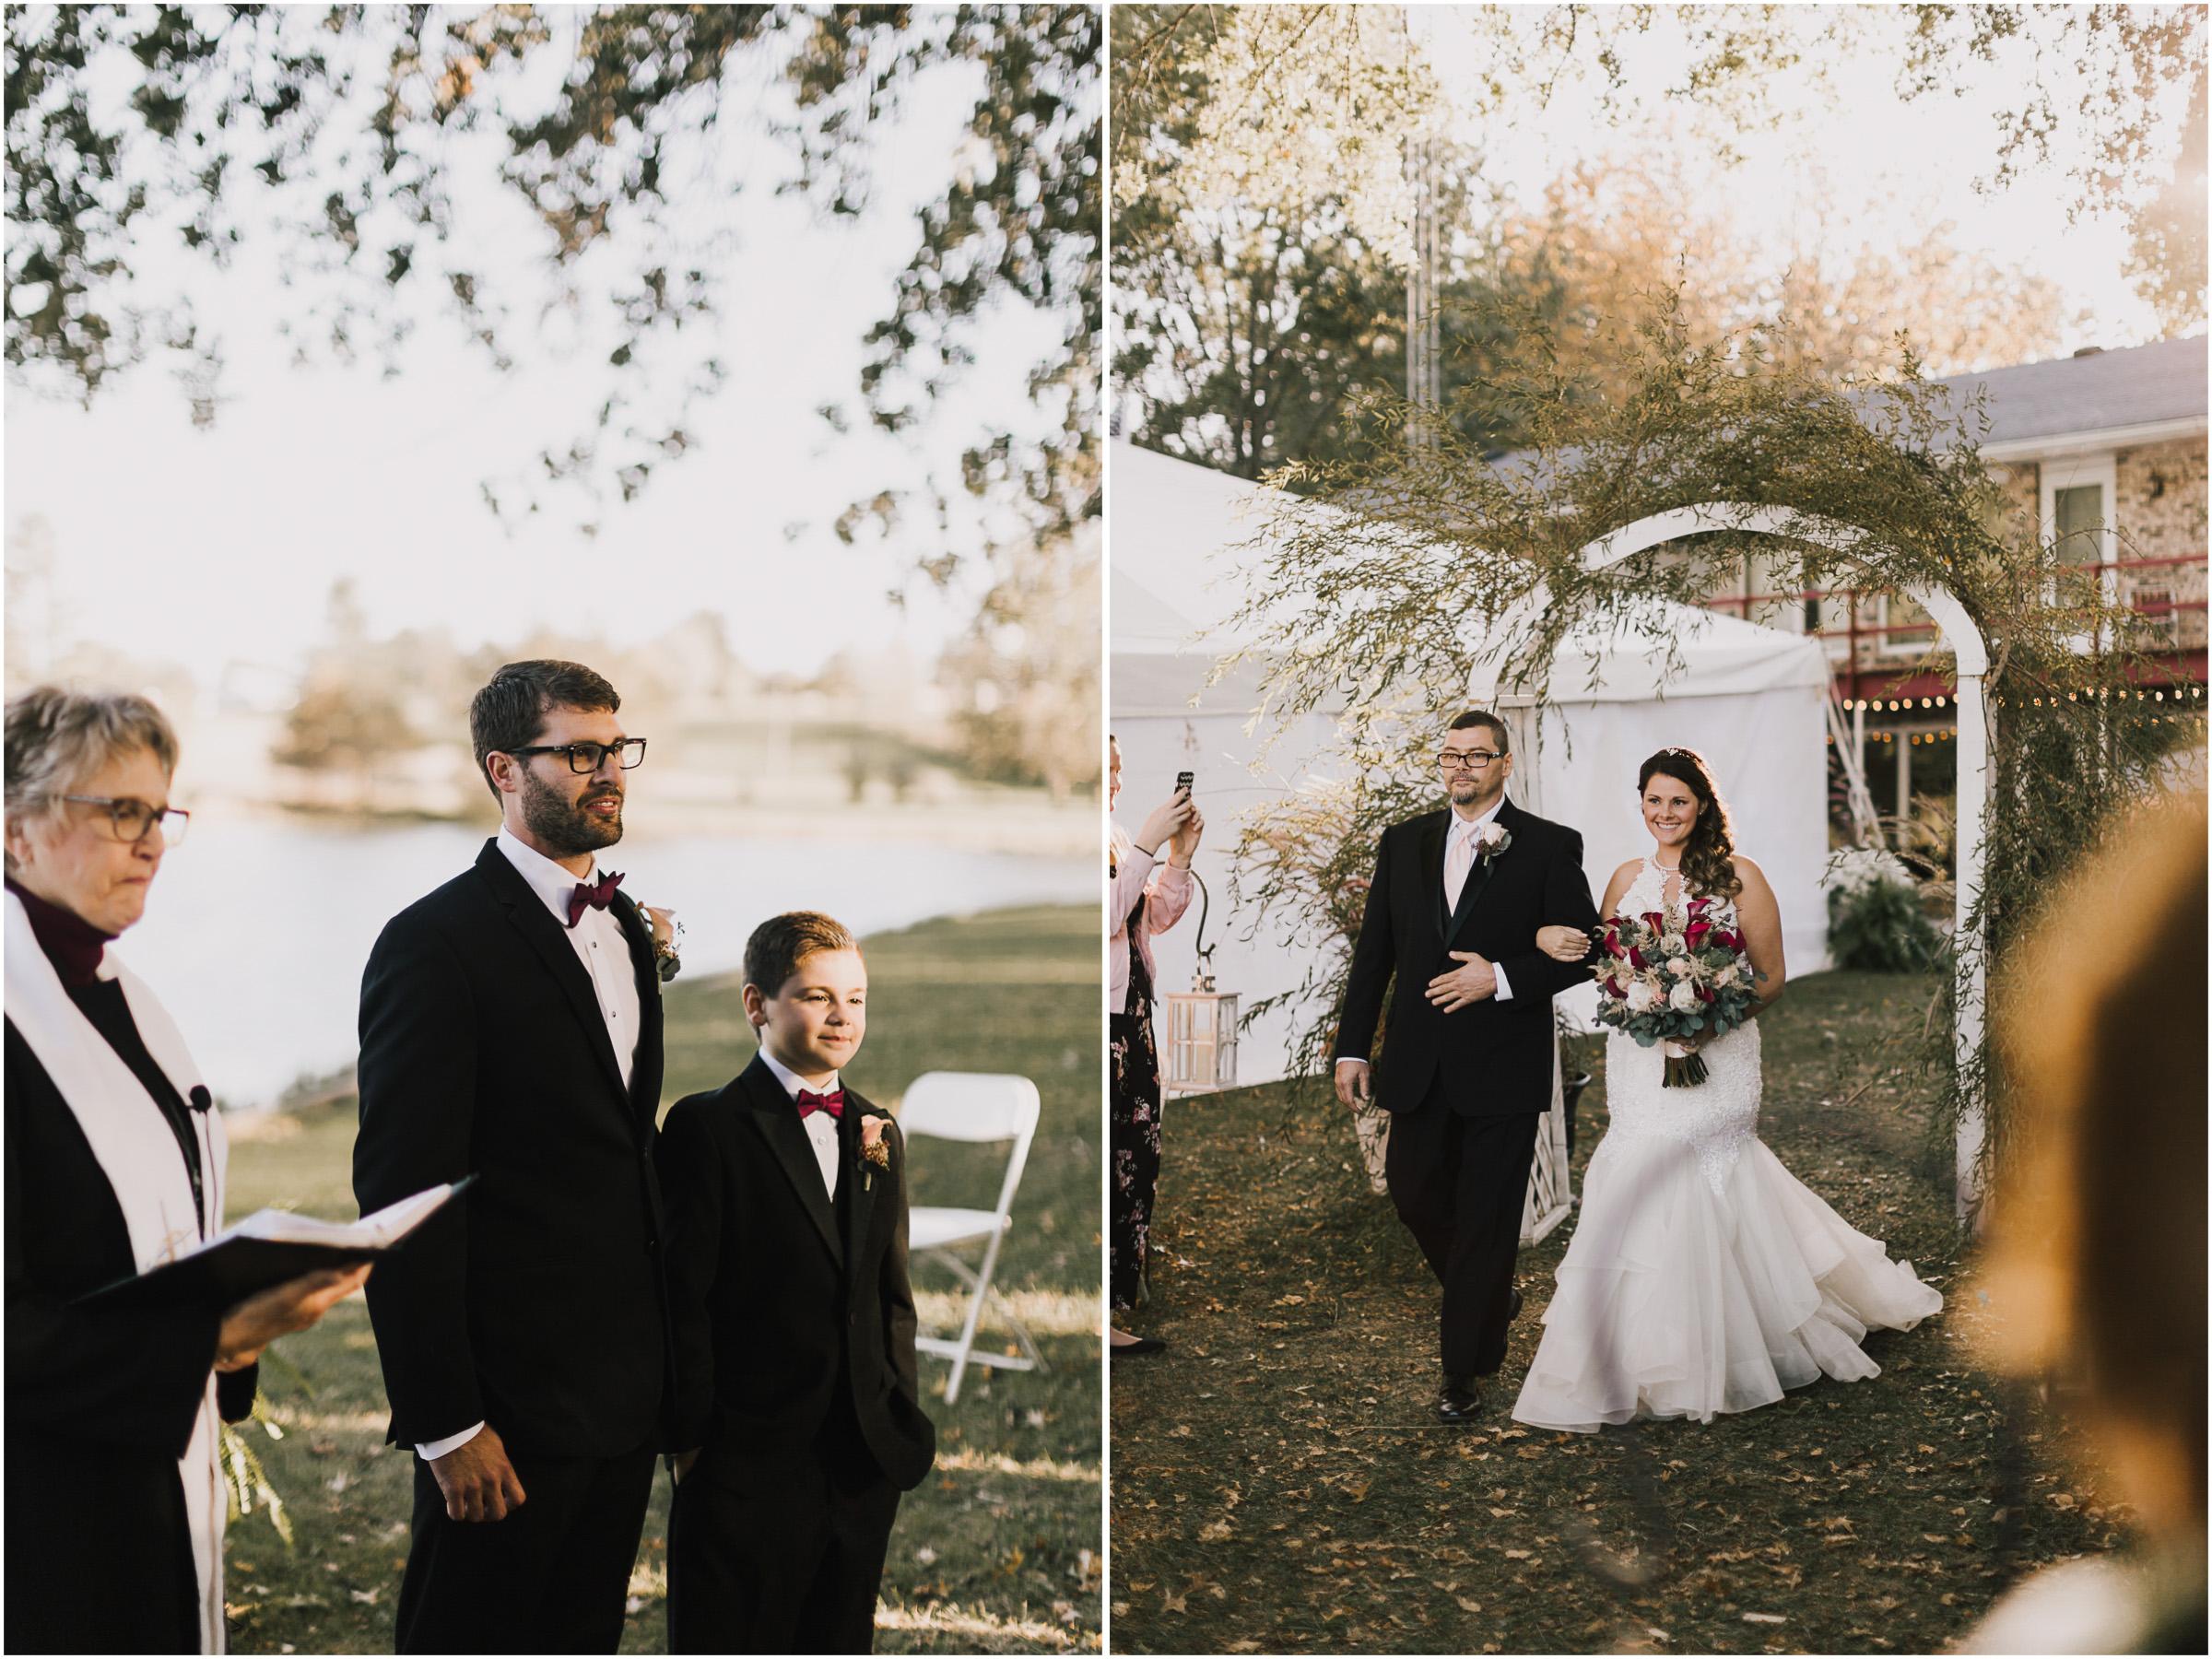 alyssa barletter photography intimate fall autumn wedding rural missouri wedding photographer-27.jpg